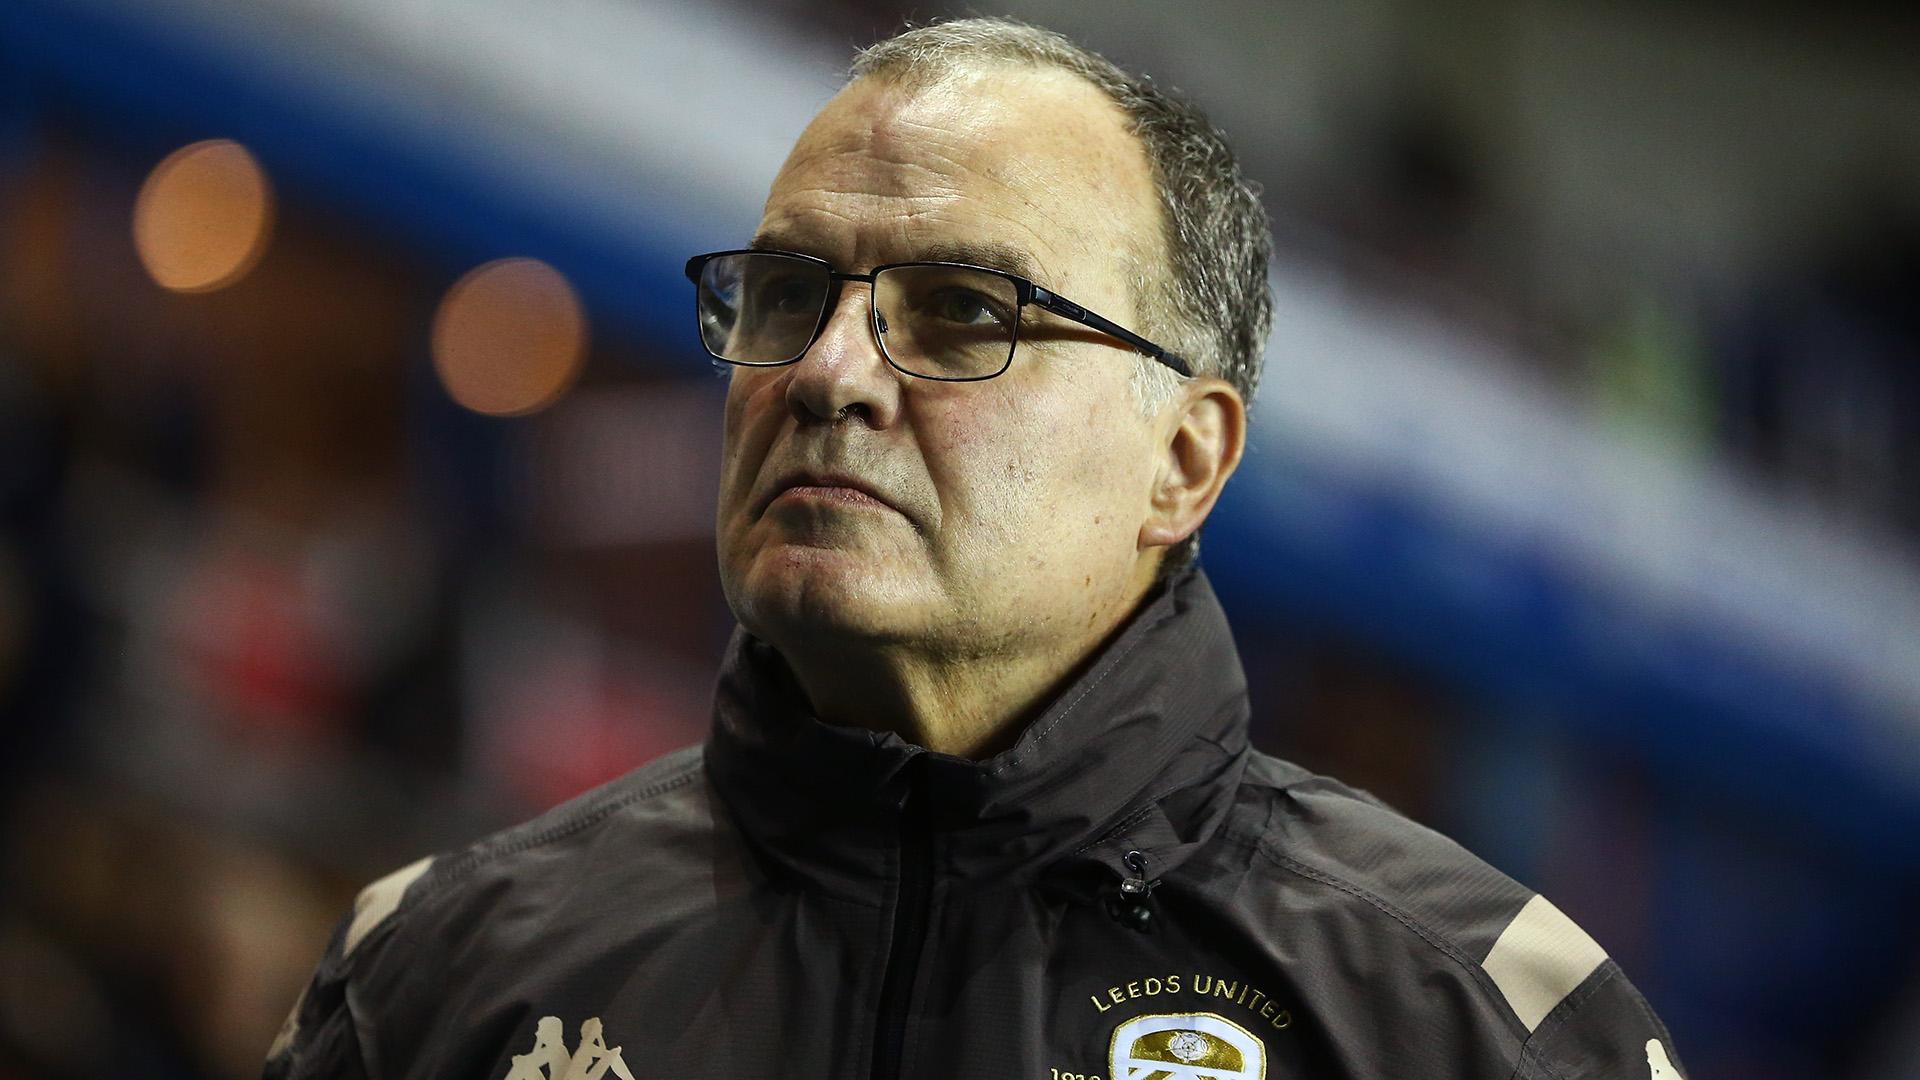 Defiant Bielsa insists Leeds won't abandon their style despite Man Utd thrashing